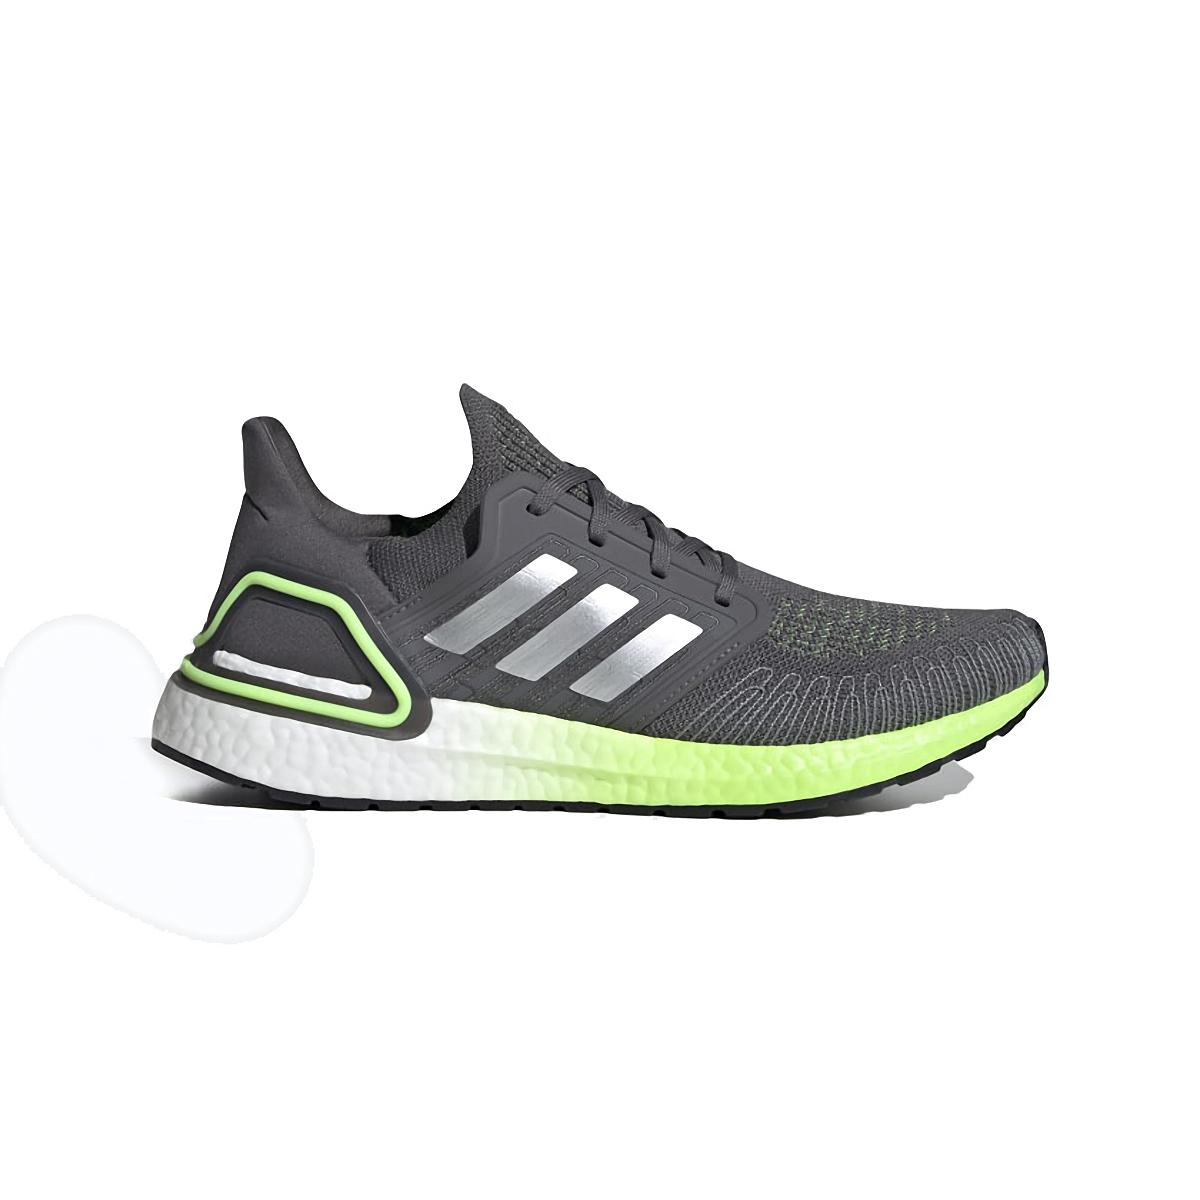 Men's Adidas Ultraboost 20 Running Shoe - Color: Grey/Silver Metallic/Signal Green  - Size: 6.5 - Width: Regular, Grey/Silver Metallic/Signal Green, large, image 1